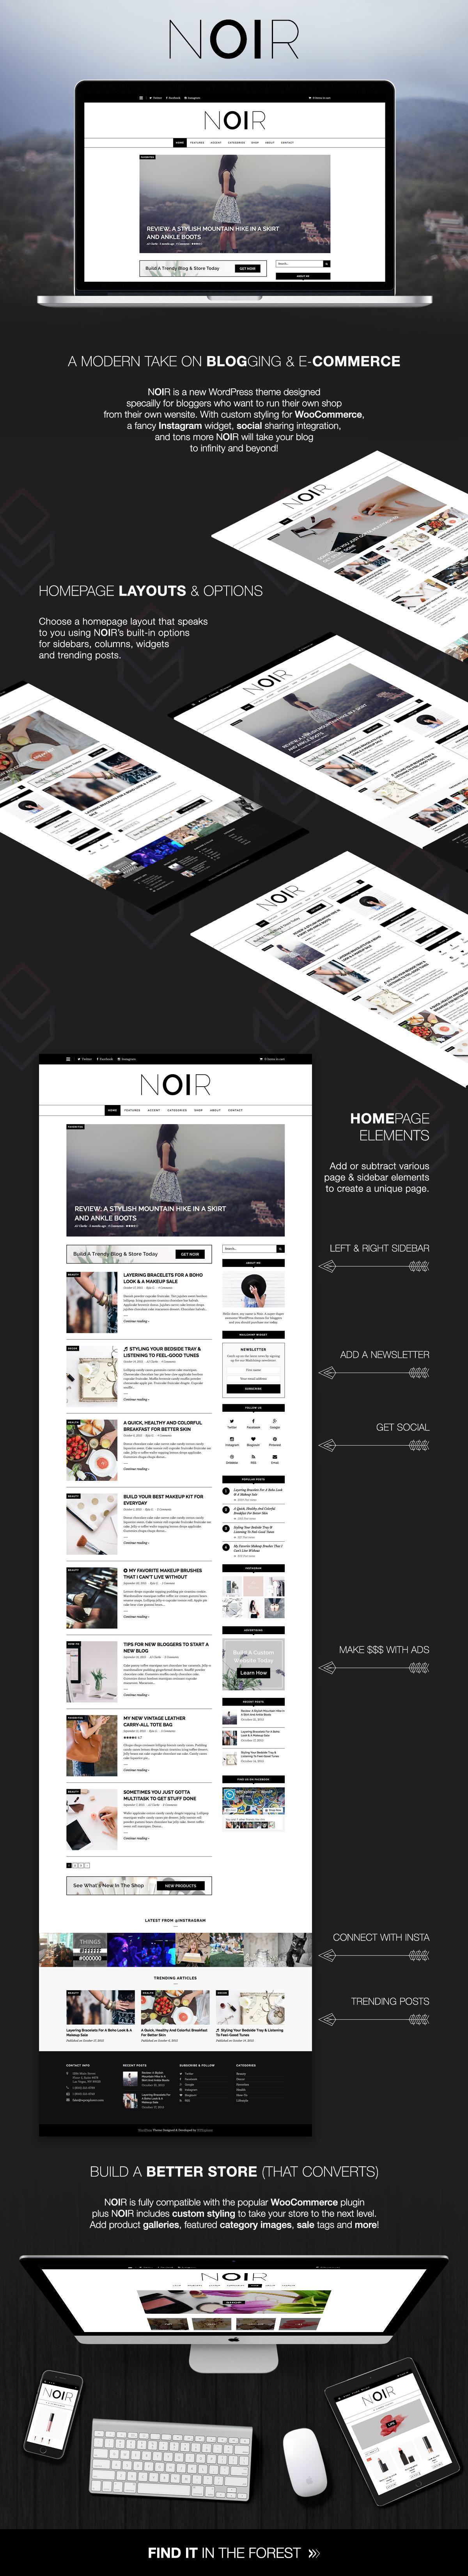 Noir WordPress Theme Funktionen